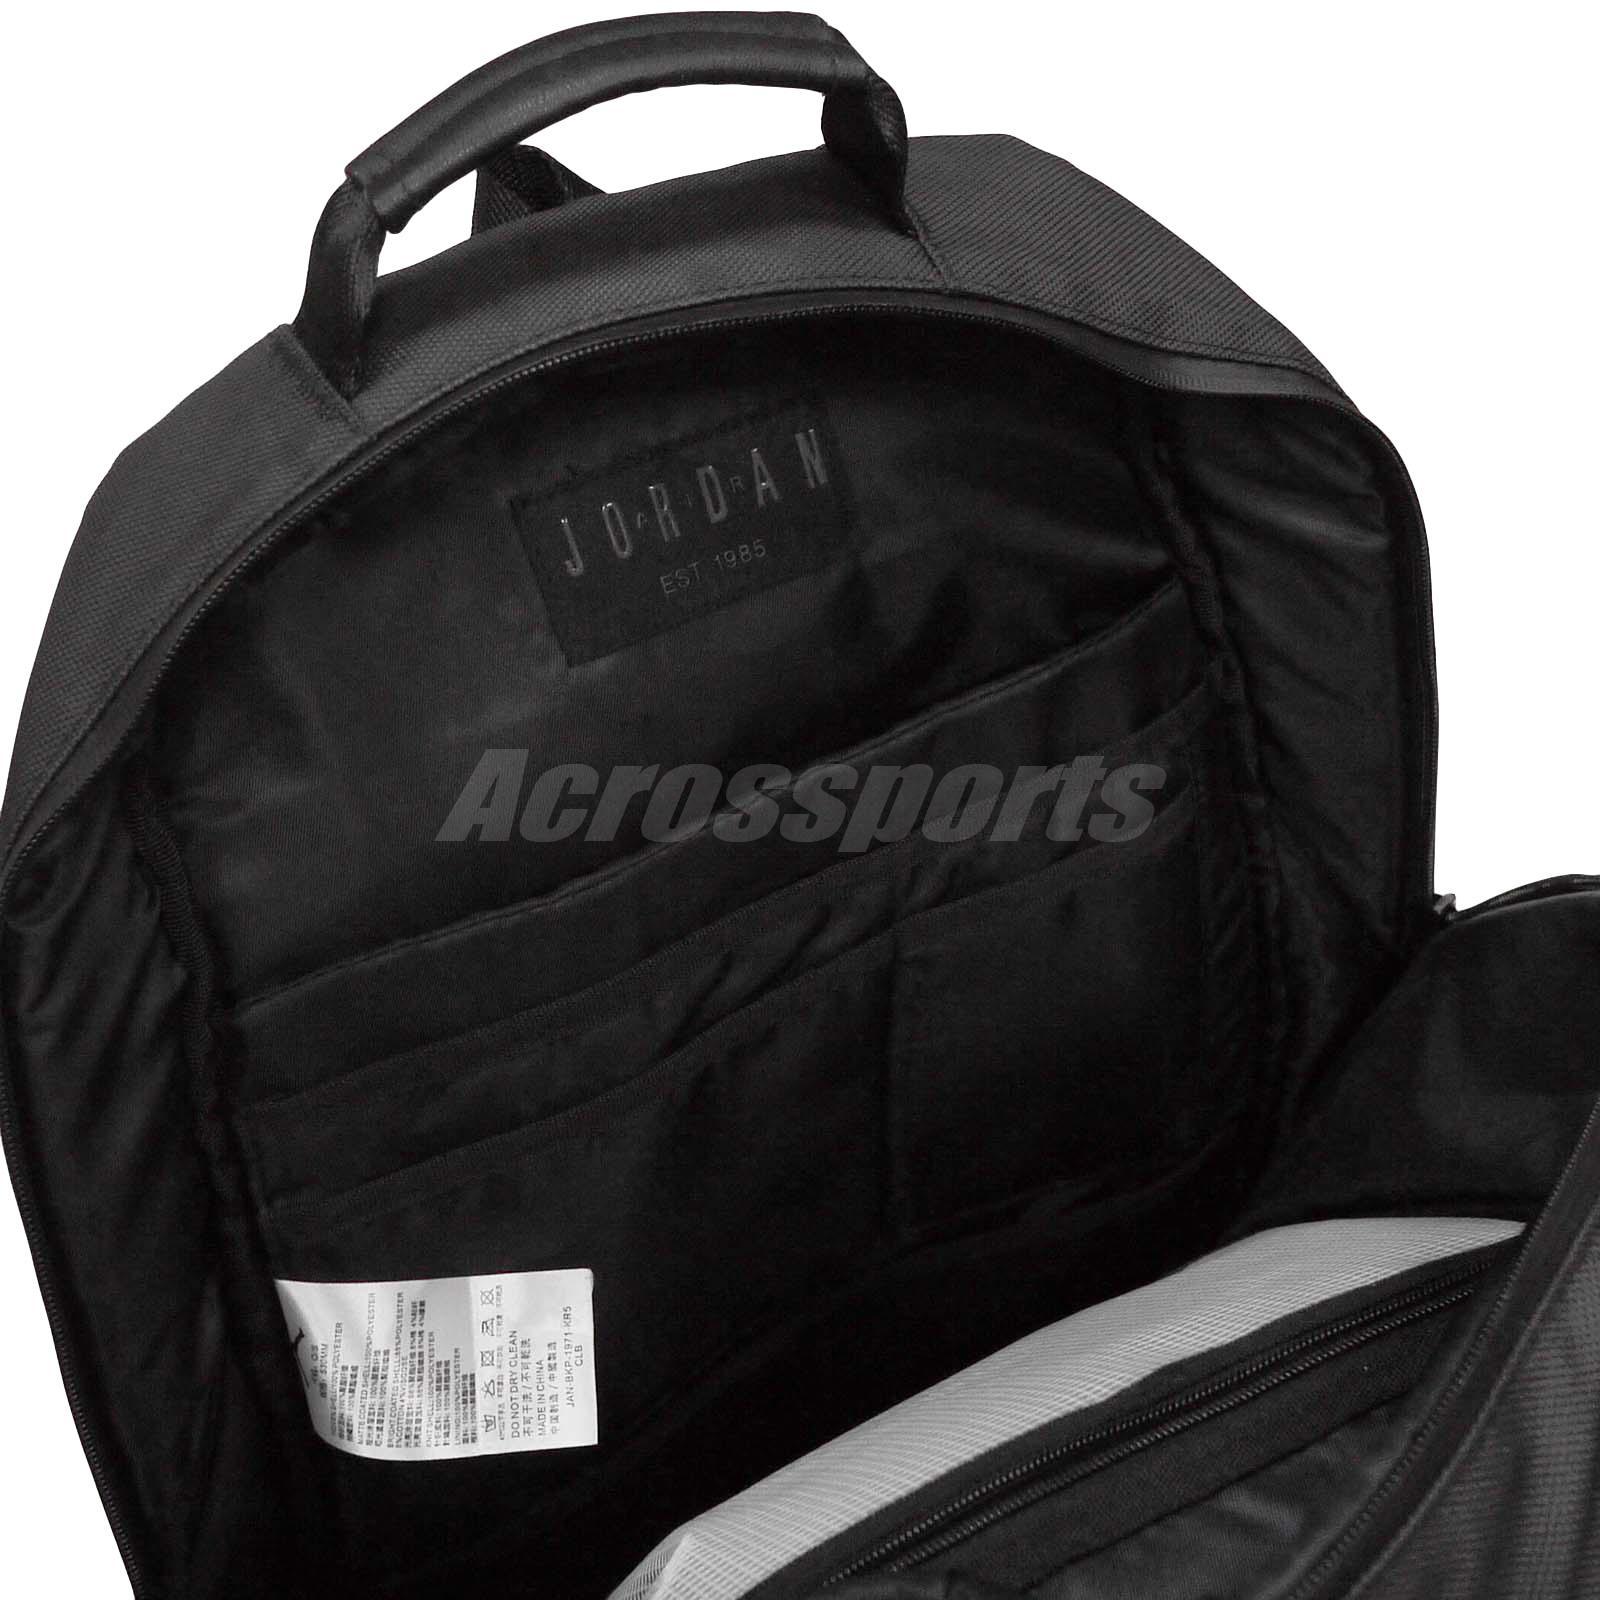 569bbb2f9cdbf2 Nike Air Jordan Retro 11 XI Pack Bred Black Red Basketball Gym ...